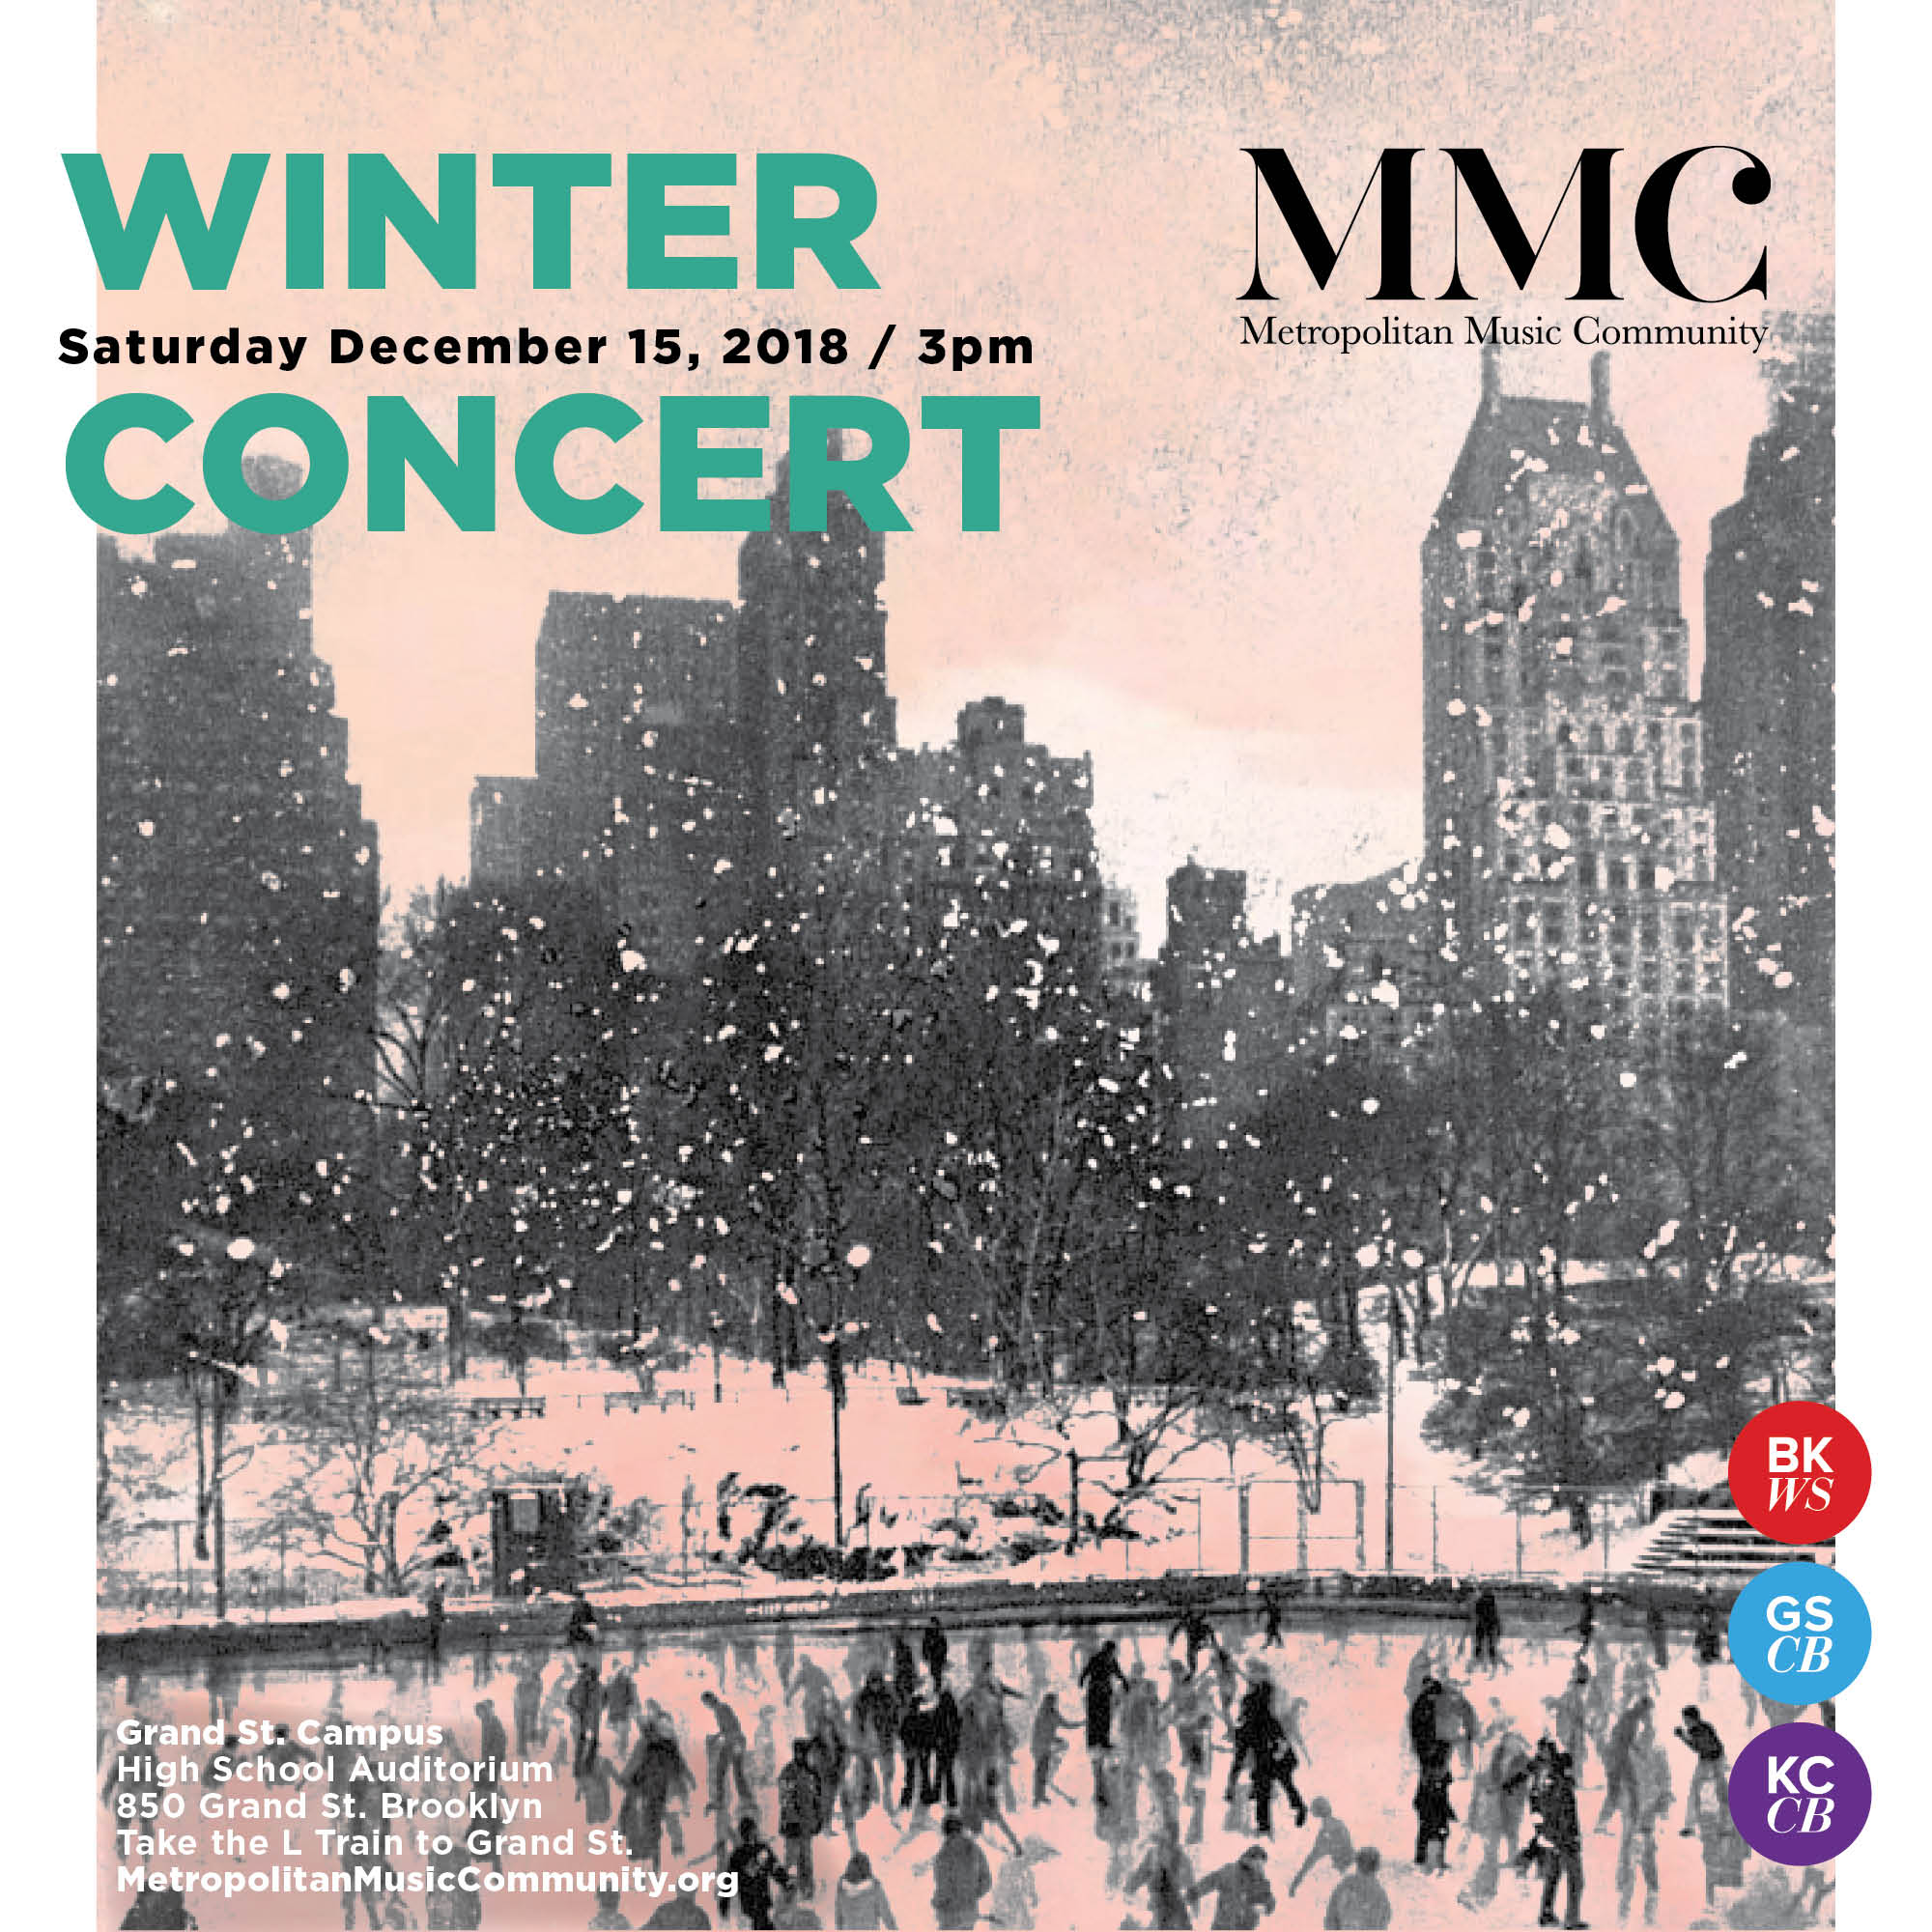 winter concert square 2018.jpg